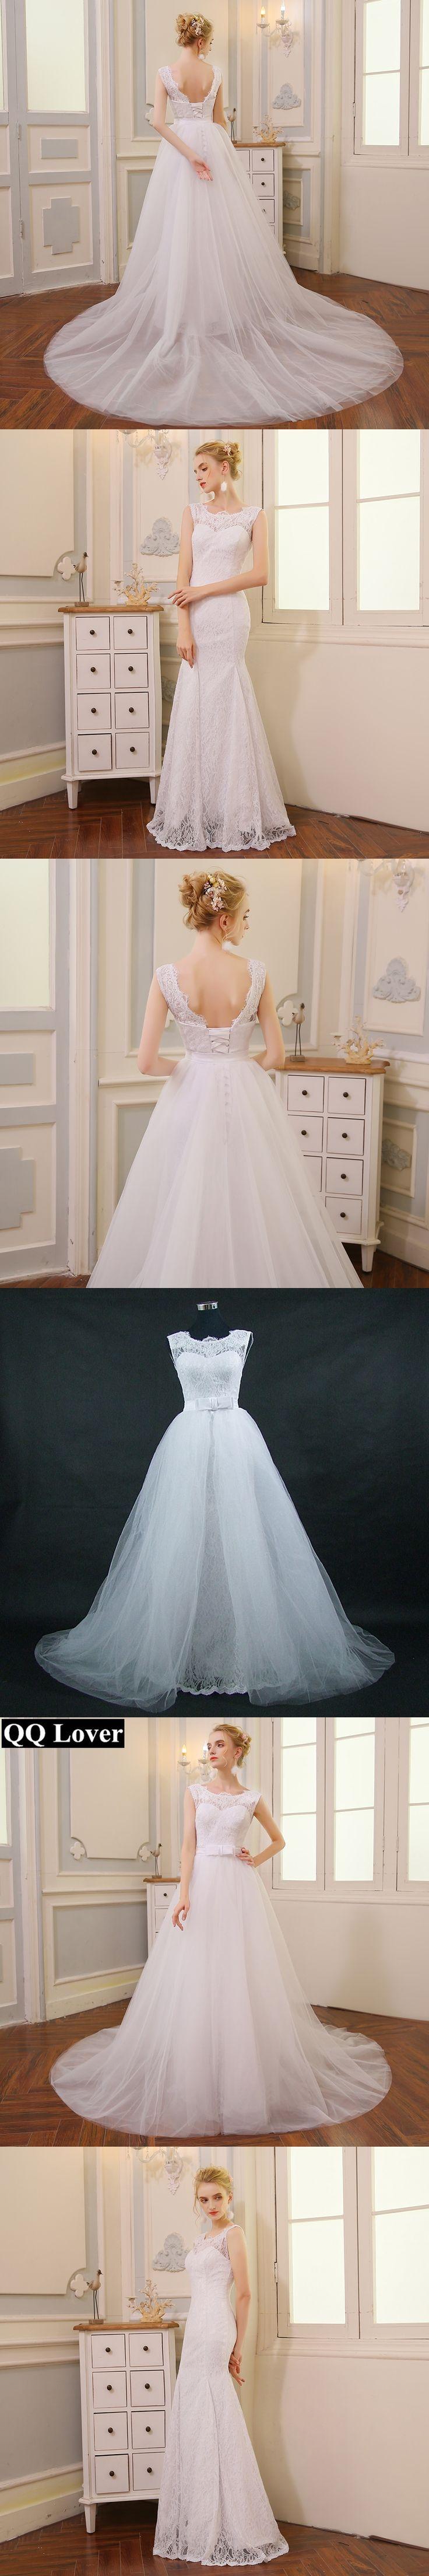 QQ Lover 2018 2 in 1 High Quality Mermaid Wedding Dress With Tulle Detachable Train Cheap Vestido De Novia Wedding Gown